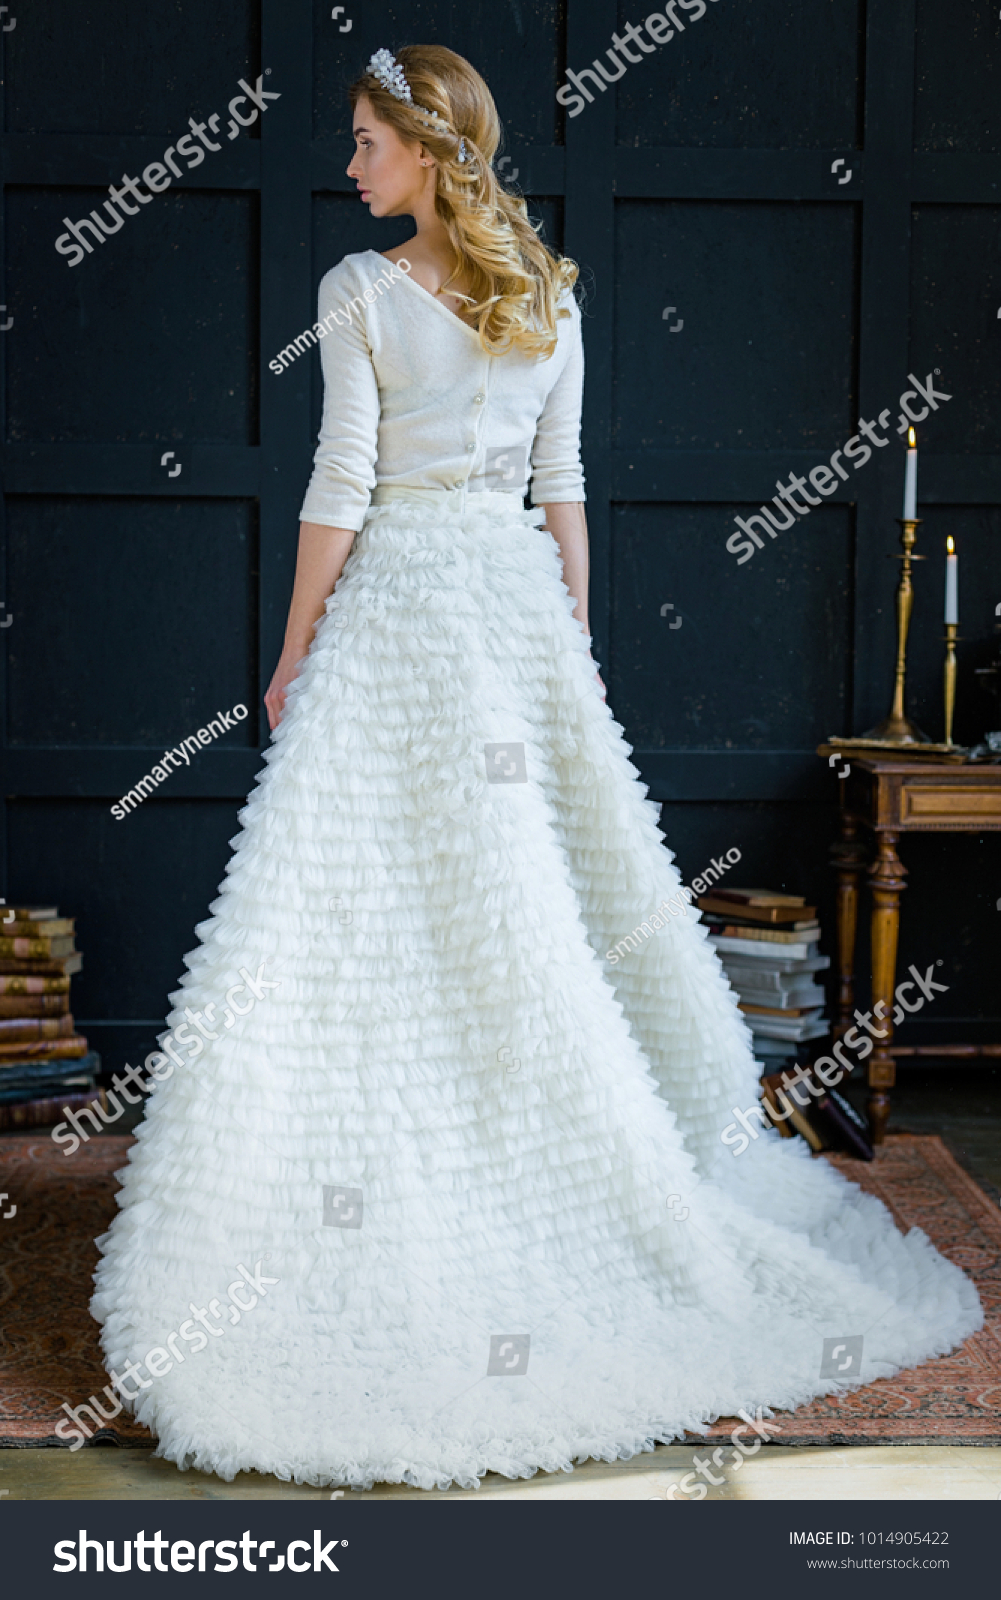 Young Beautiful Woman Elegant Wedding Dress Stock Photo (100% Legal ...